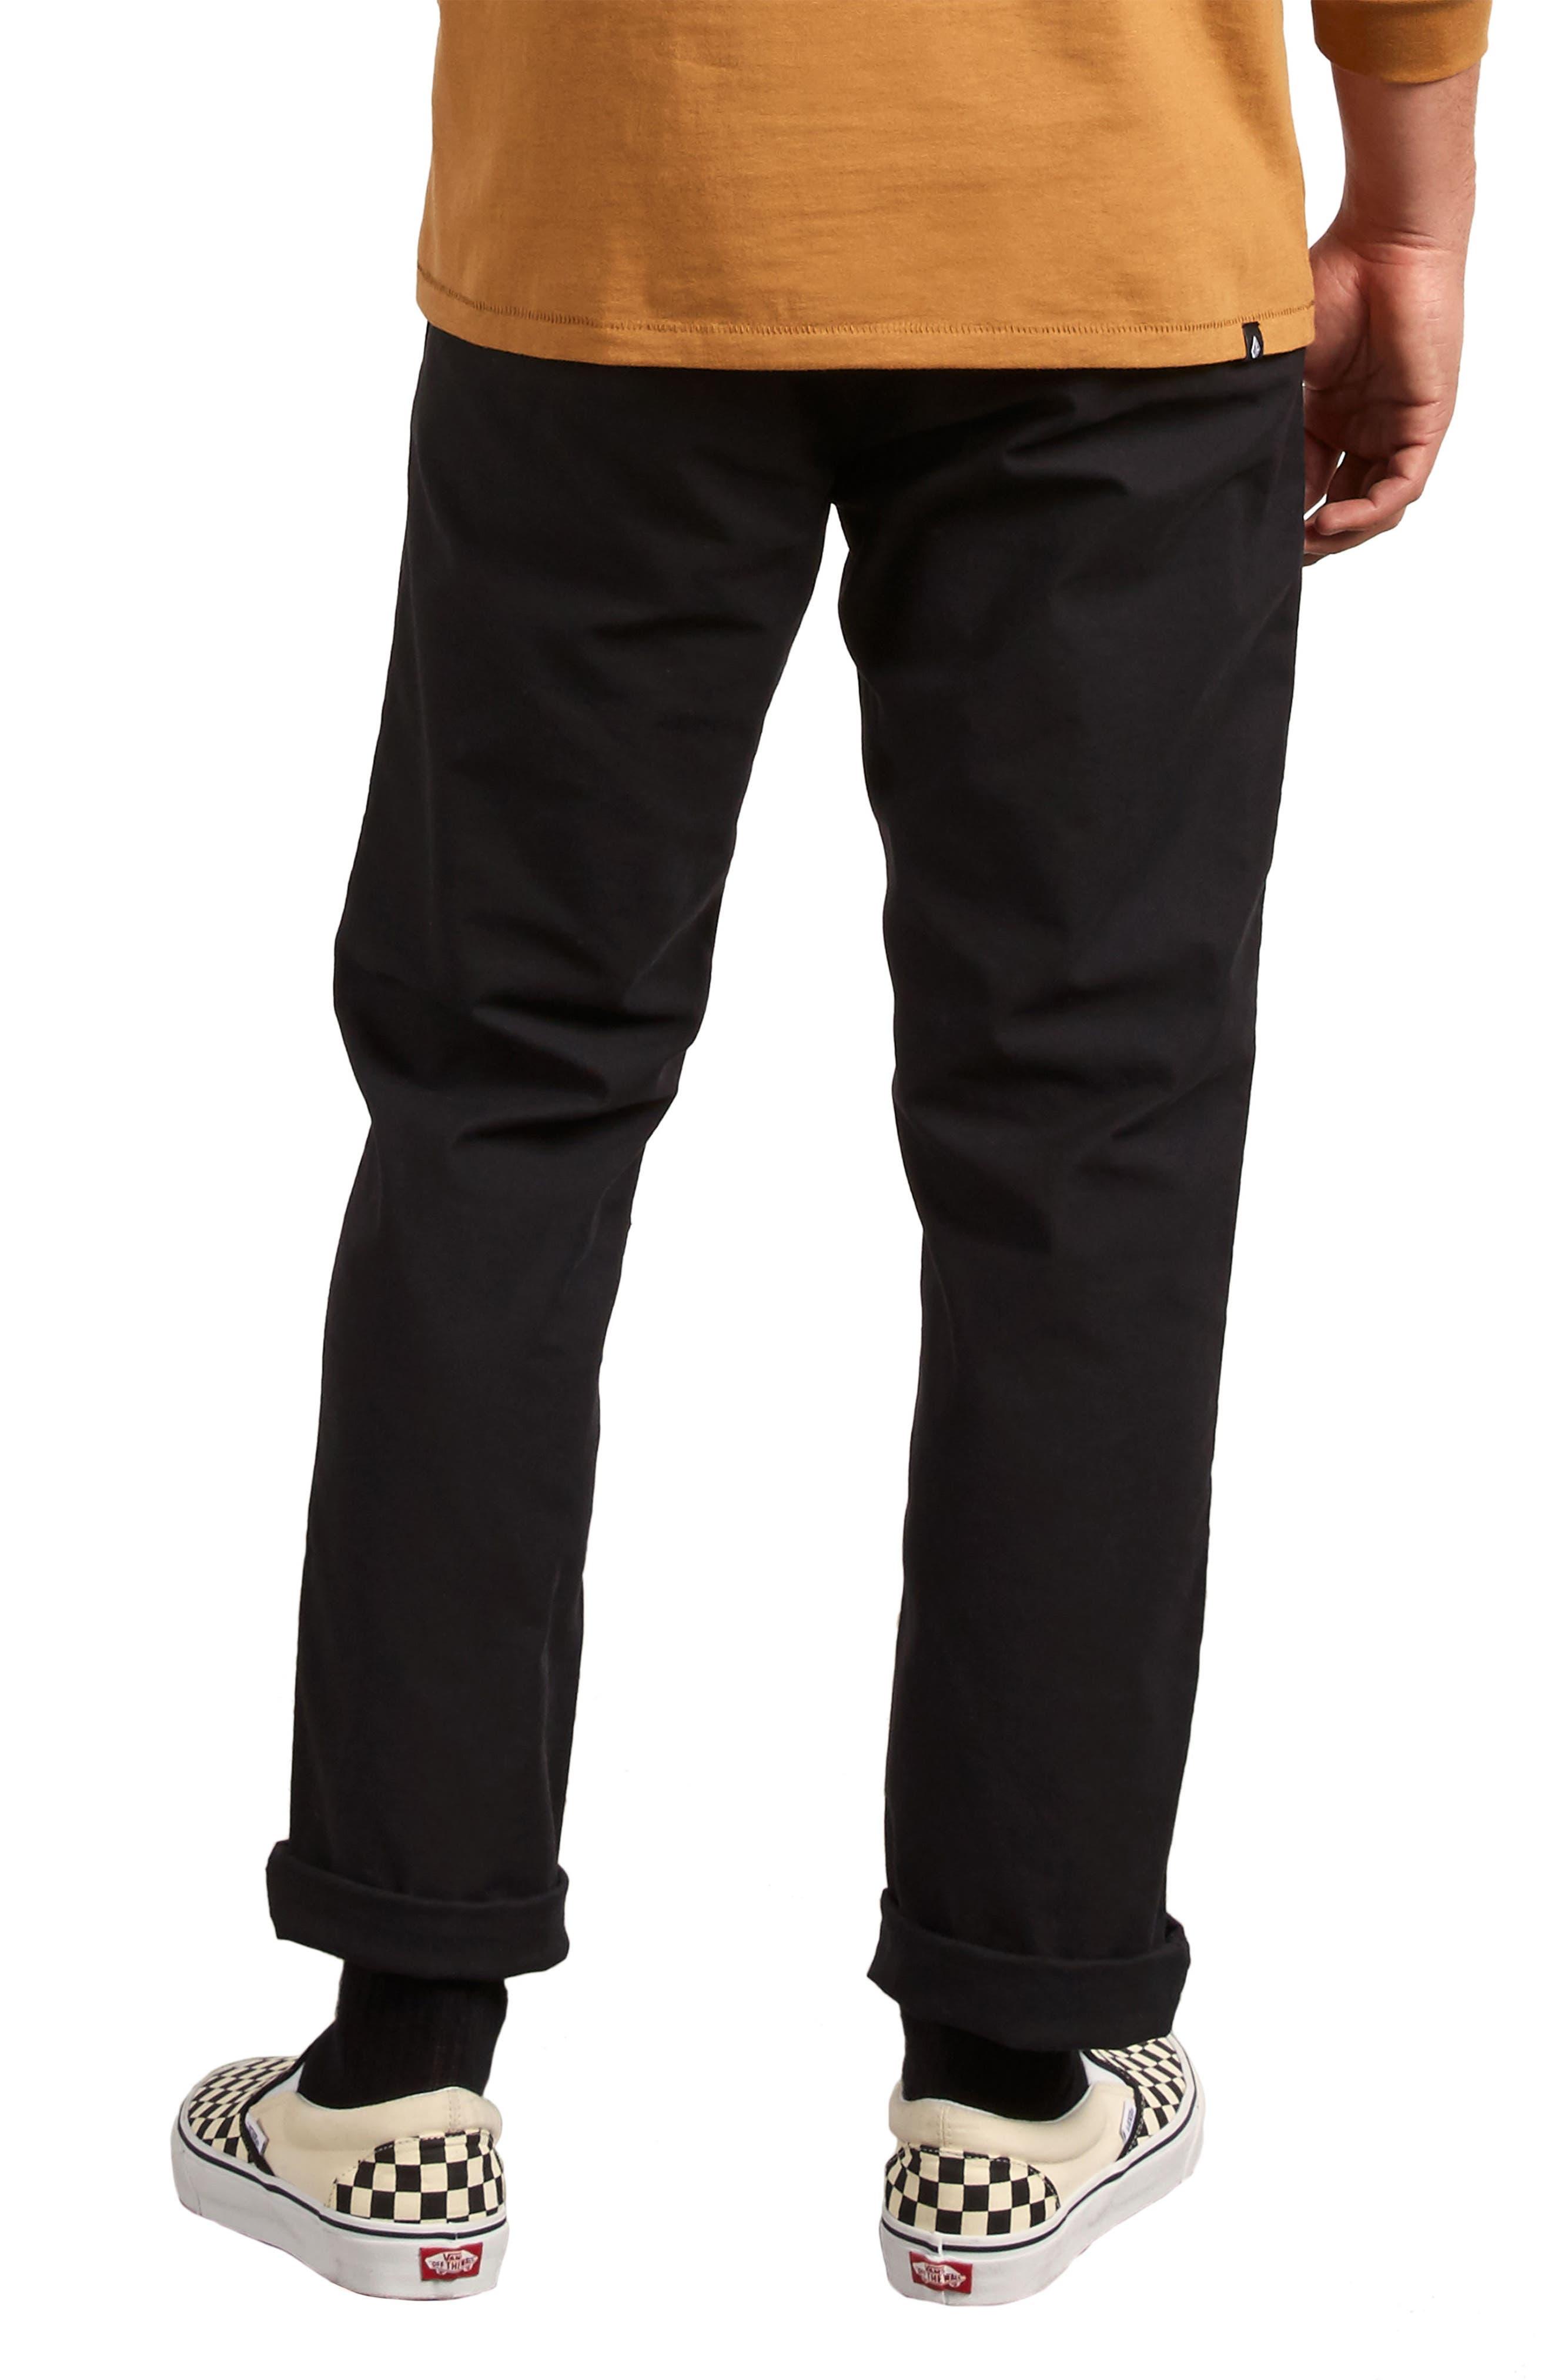 Gritter Modern Fit Straight Leg Chino Pants,                             Alternate thumbnail 2, color,                             BLACK